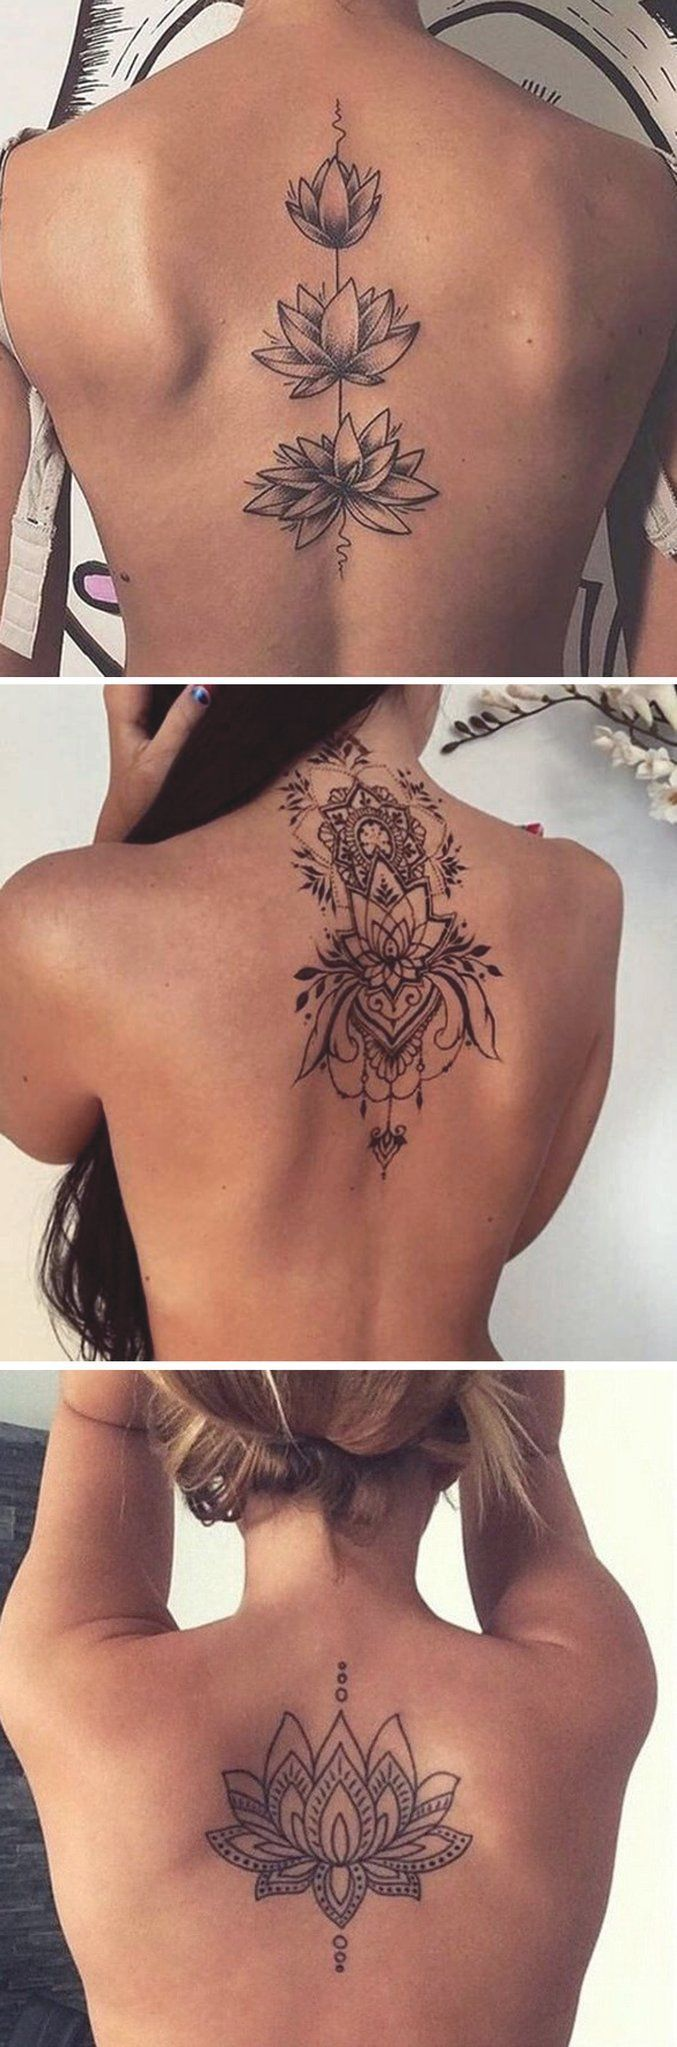 Photo of Realistische Lotus Mandala Tattoo Back Ideas – Unalome Spine Tat – kleine Lotus … – Tattoos